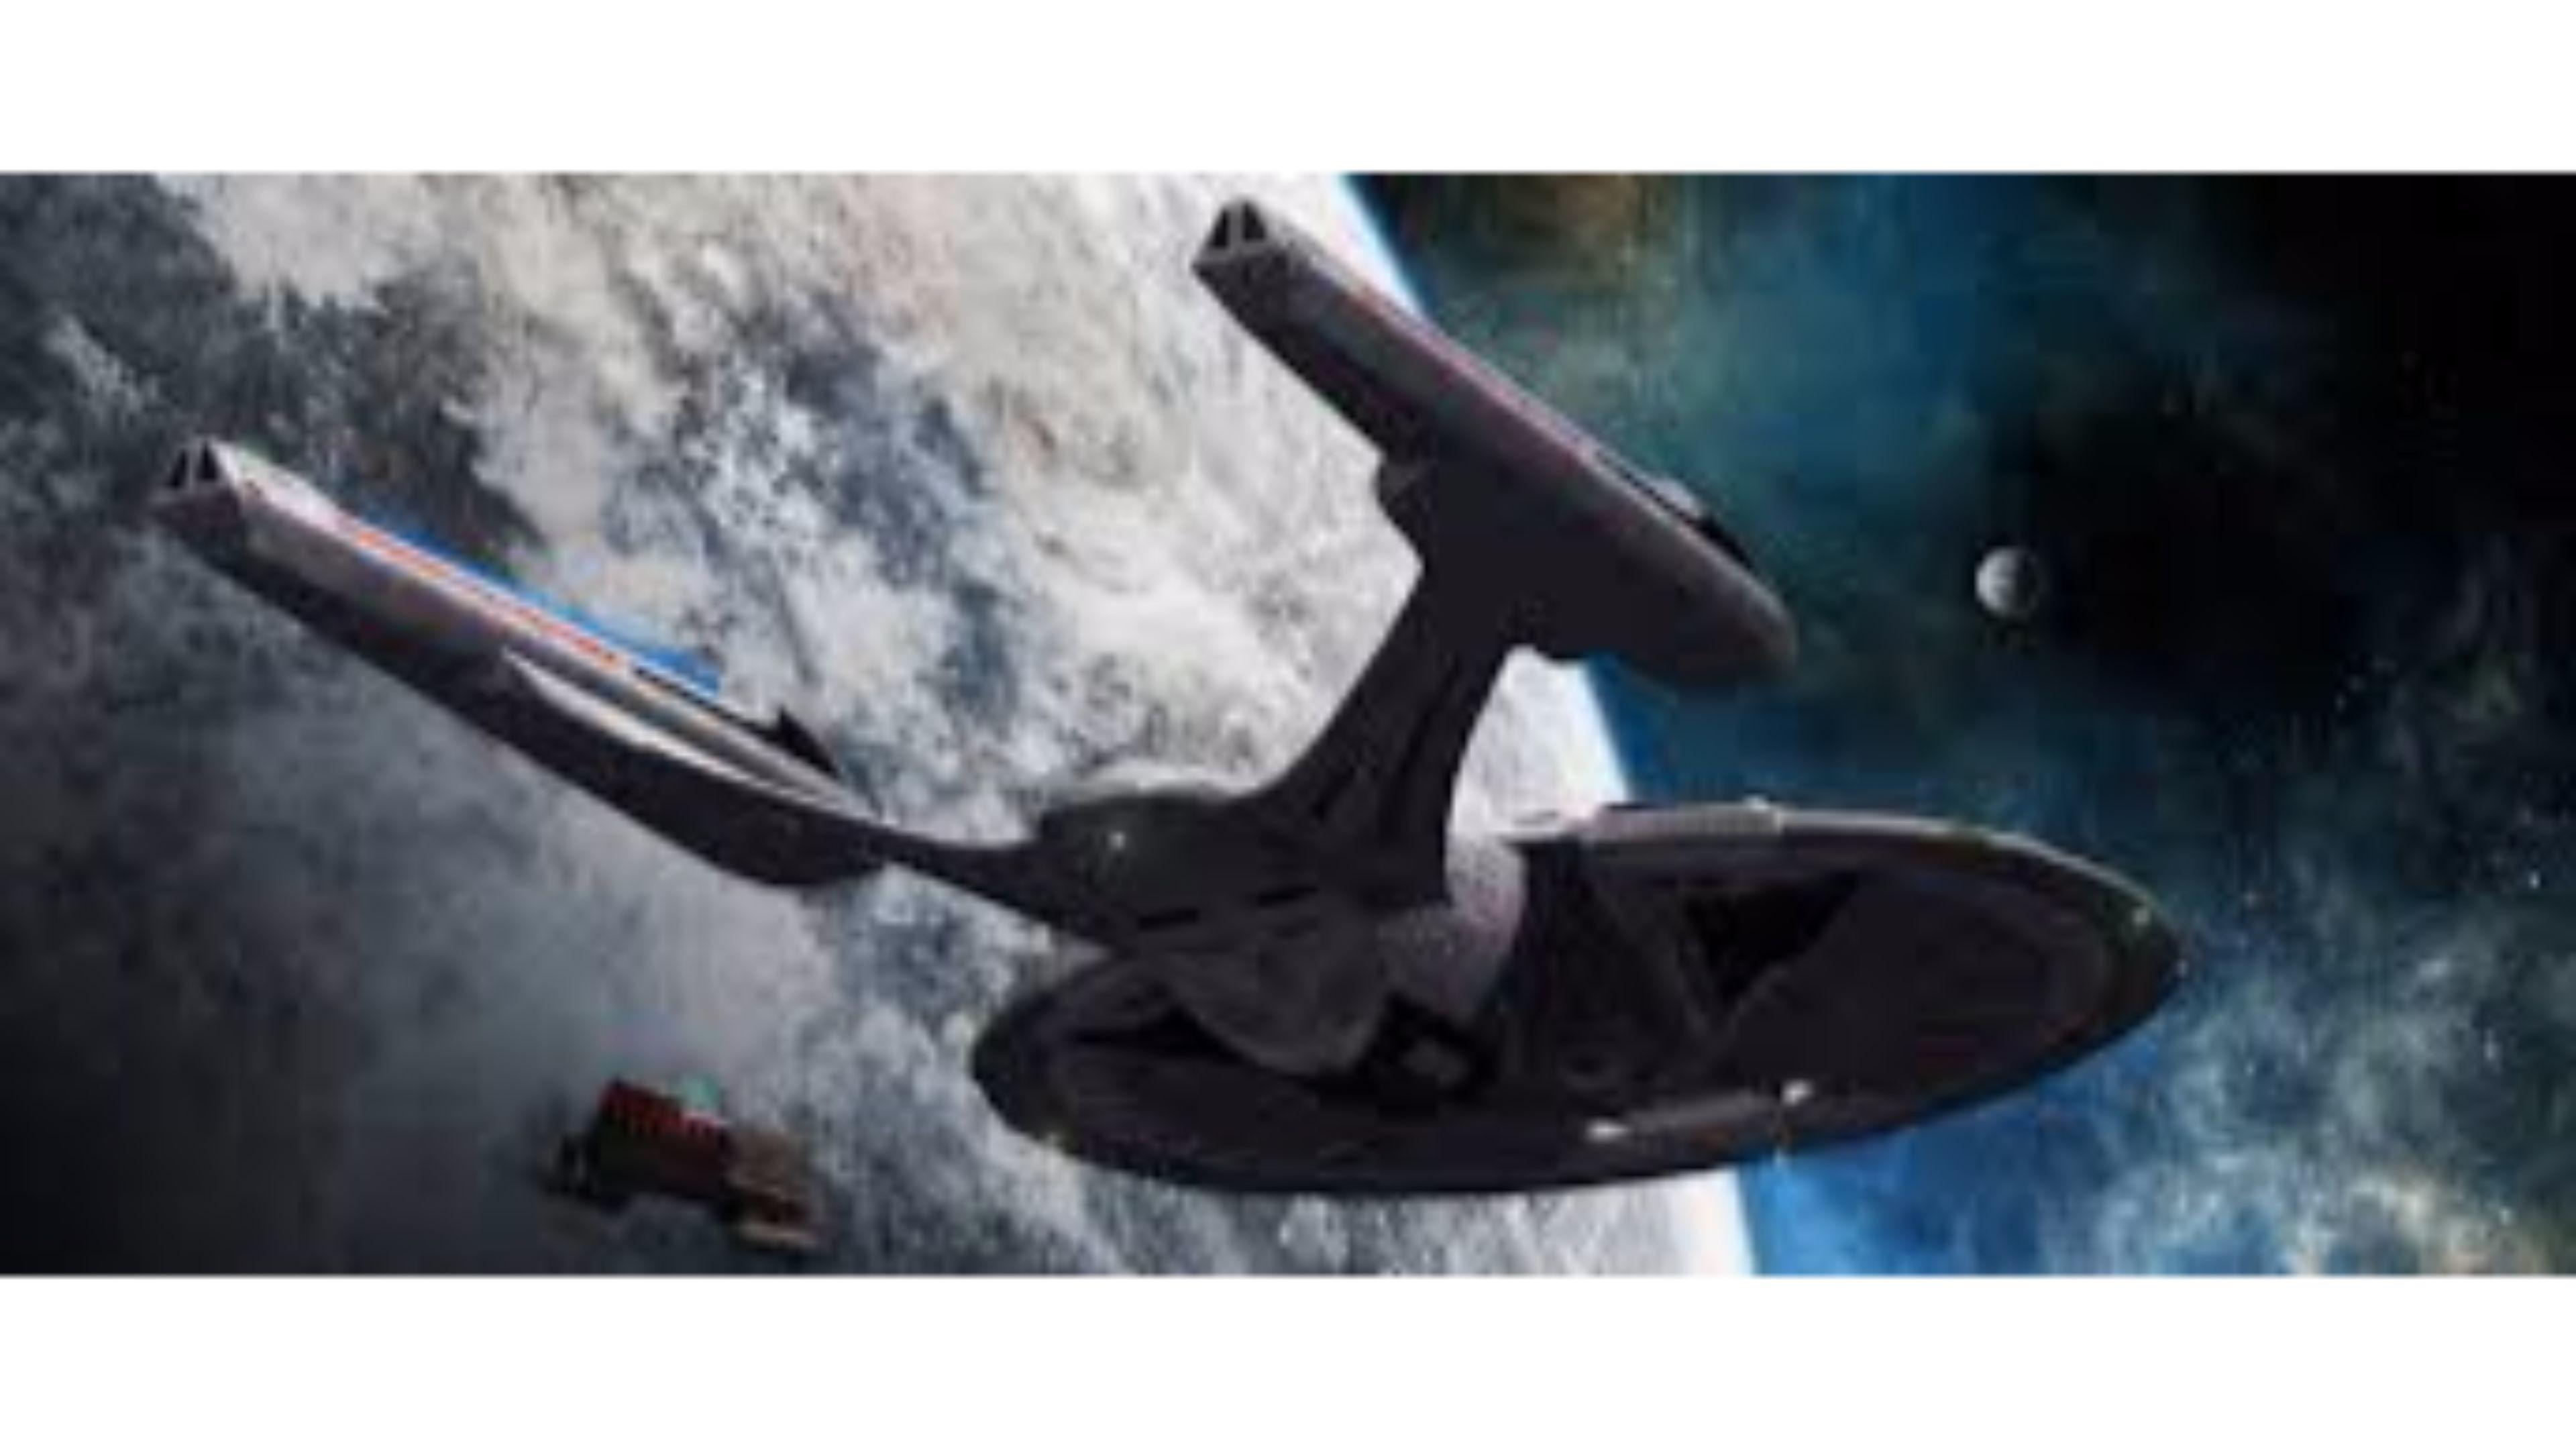 Best Star Trek Beyond 4K Wallpaper | Free 4K Wallpaper